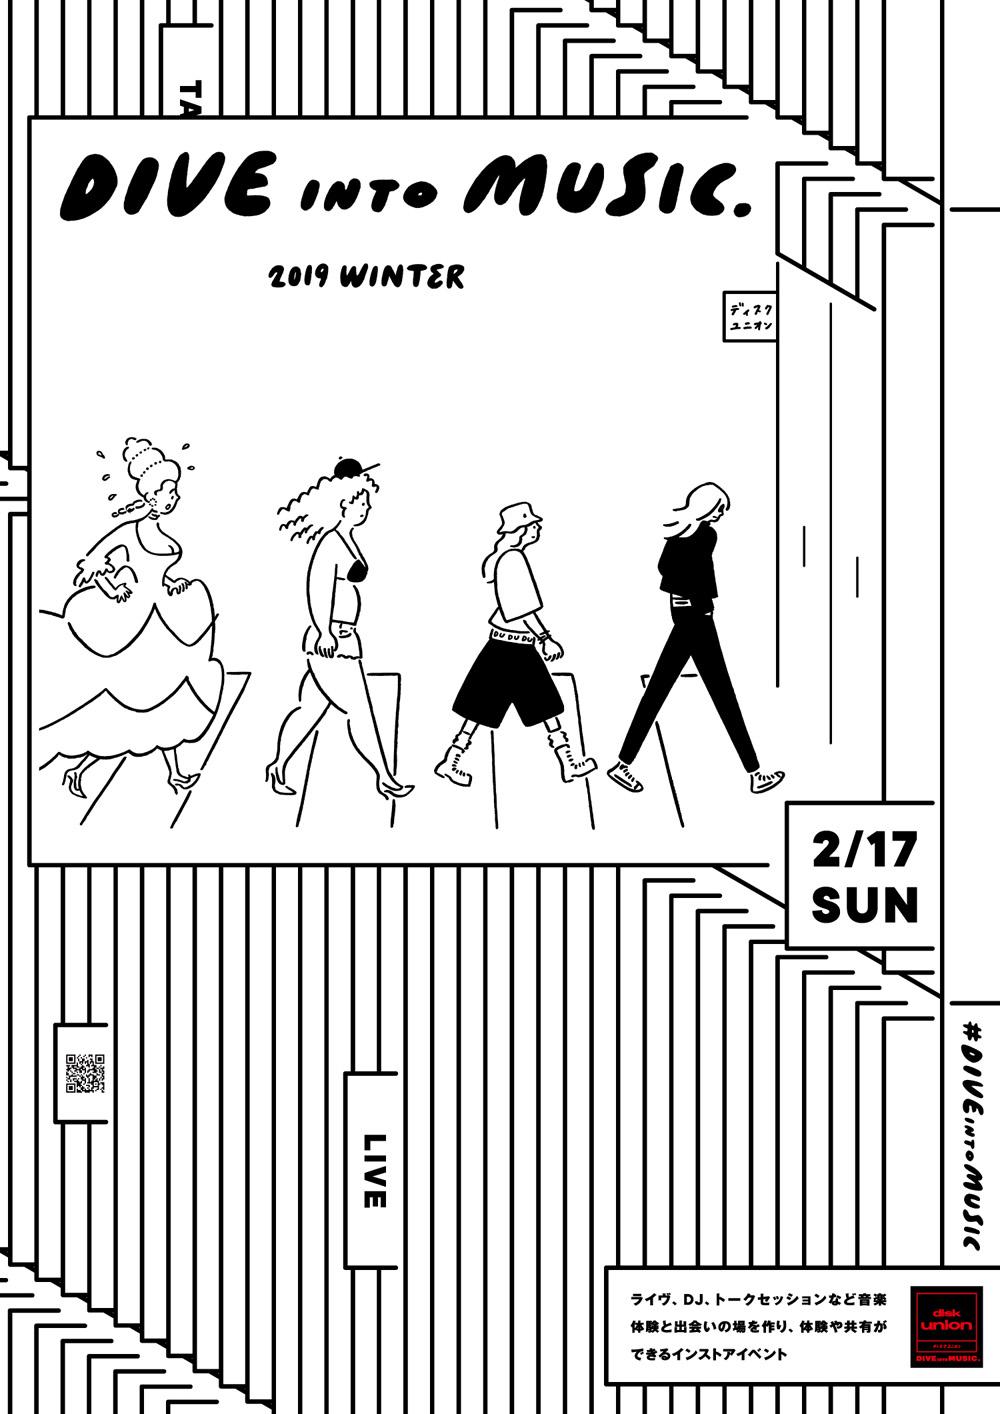 DIVE INTO MUSIC. 2019 WINTER